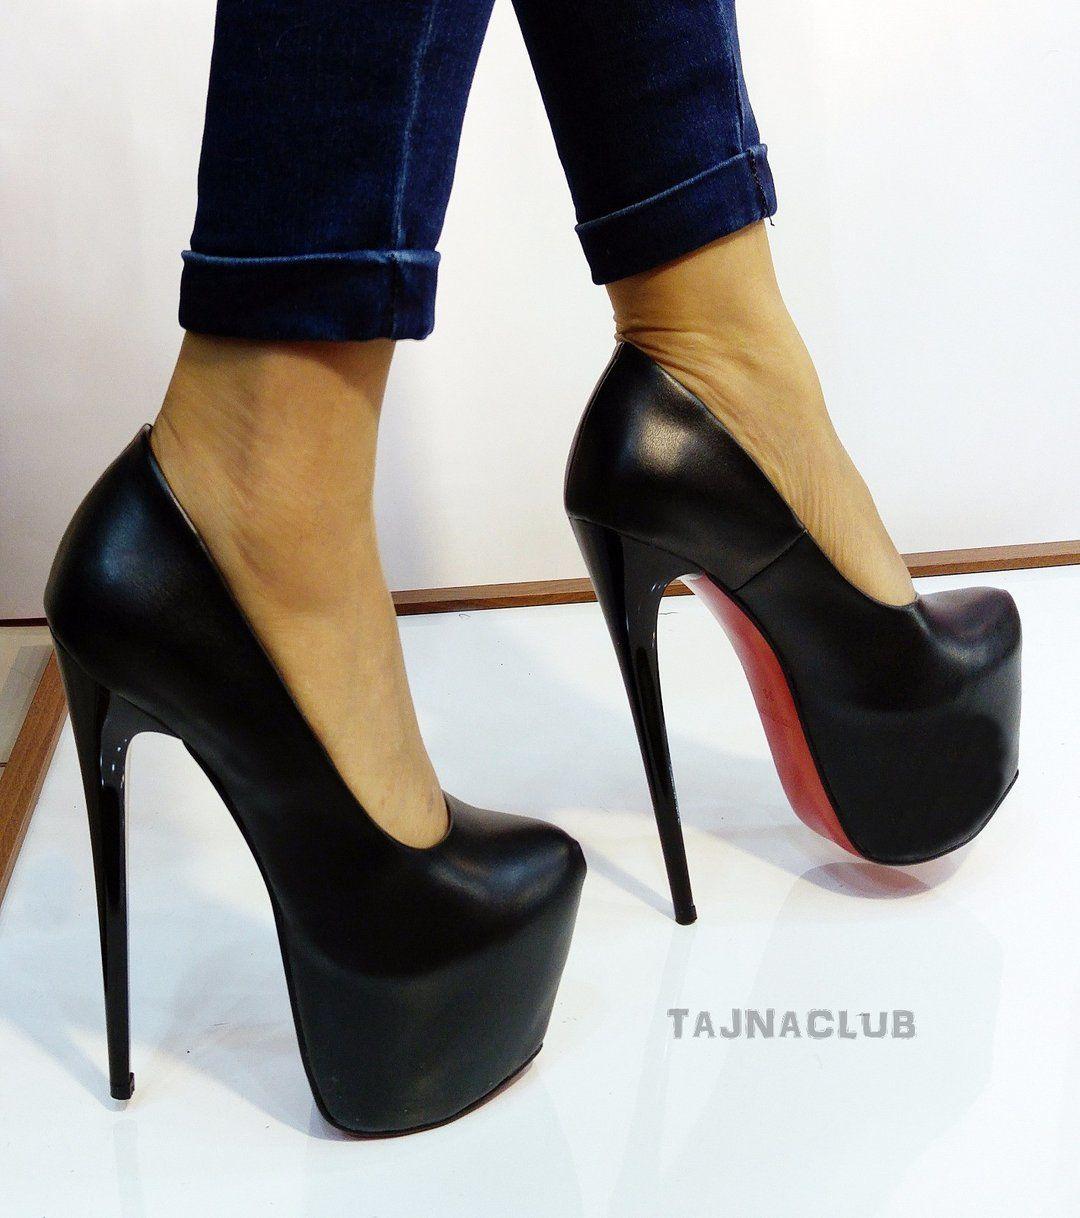 black leather high heel pumps